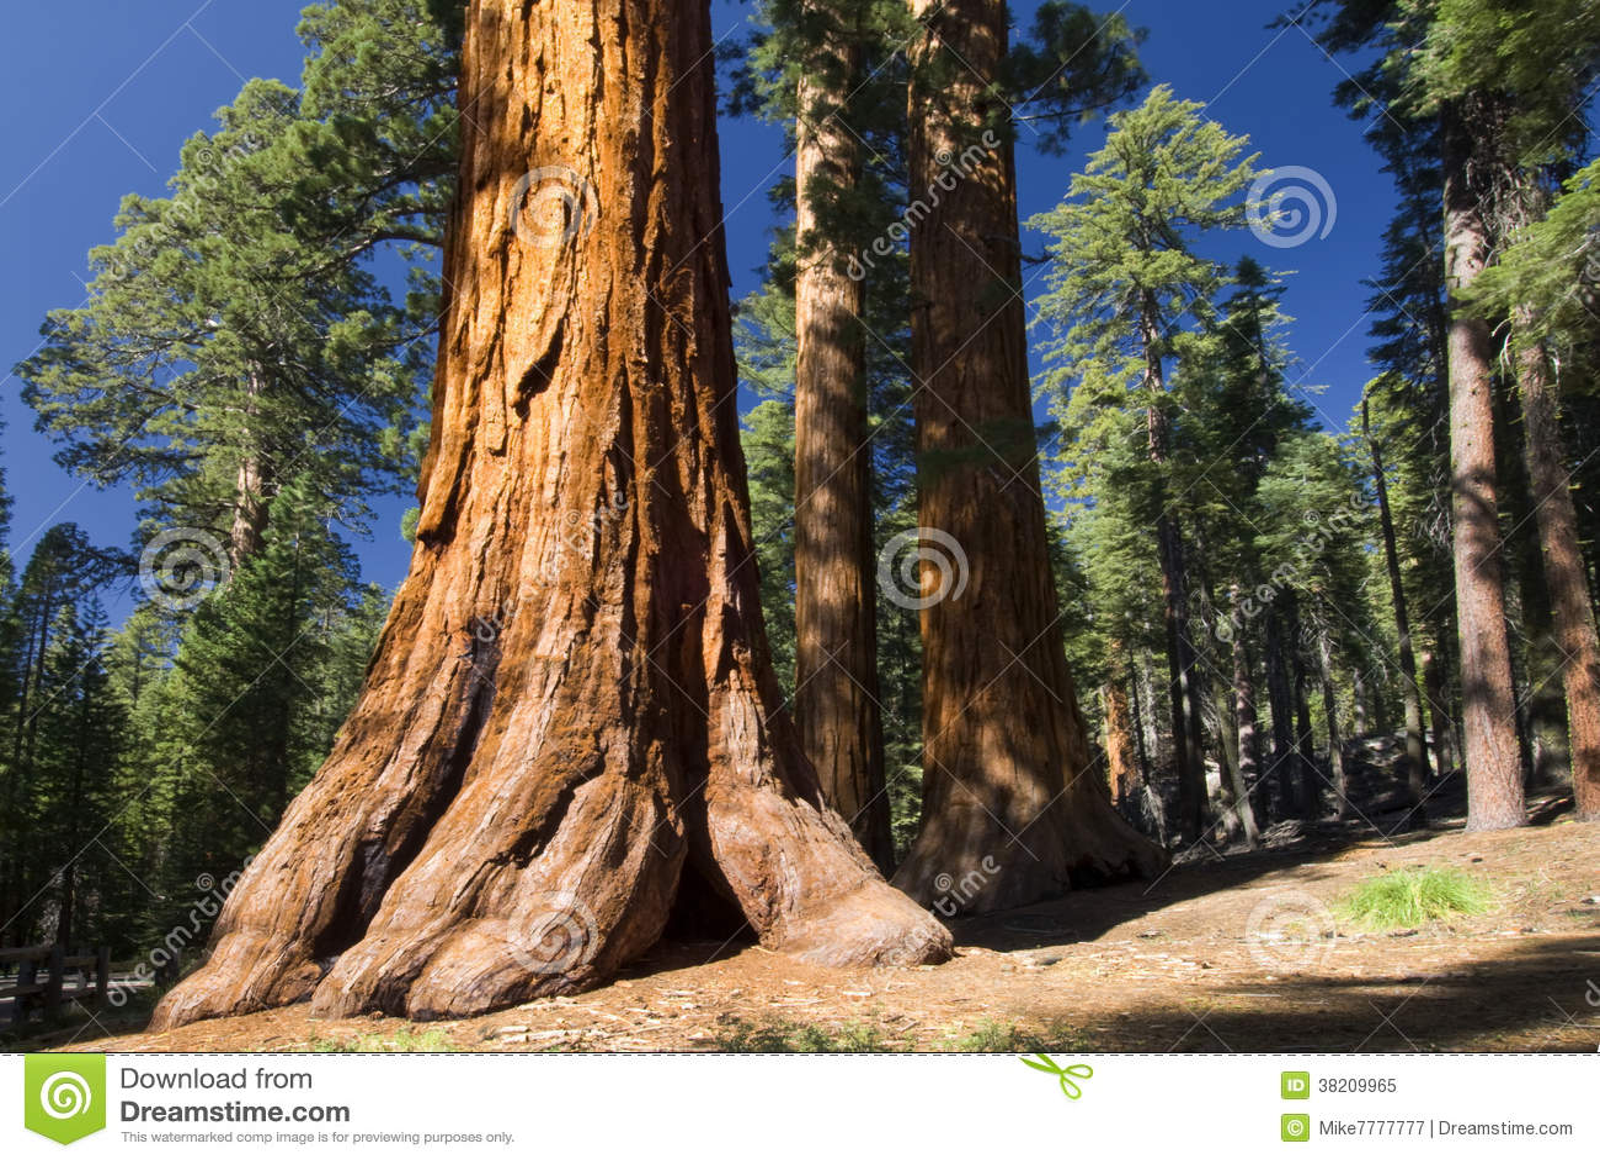 Préférence Giant Sequoia Tree, Mariposa Grove, Yosemite National Park  EA76